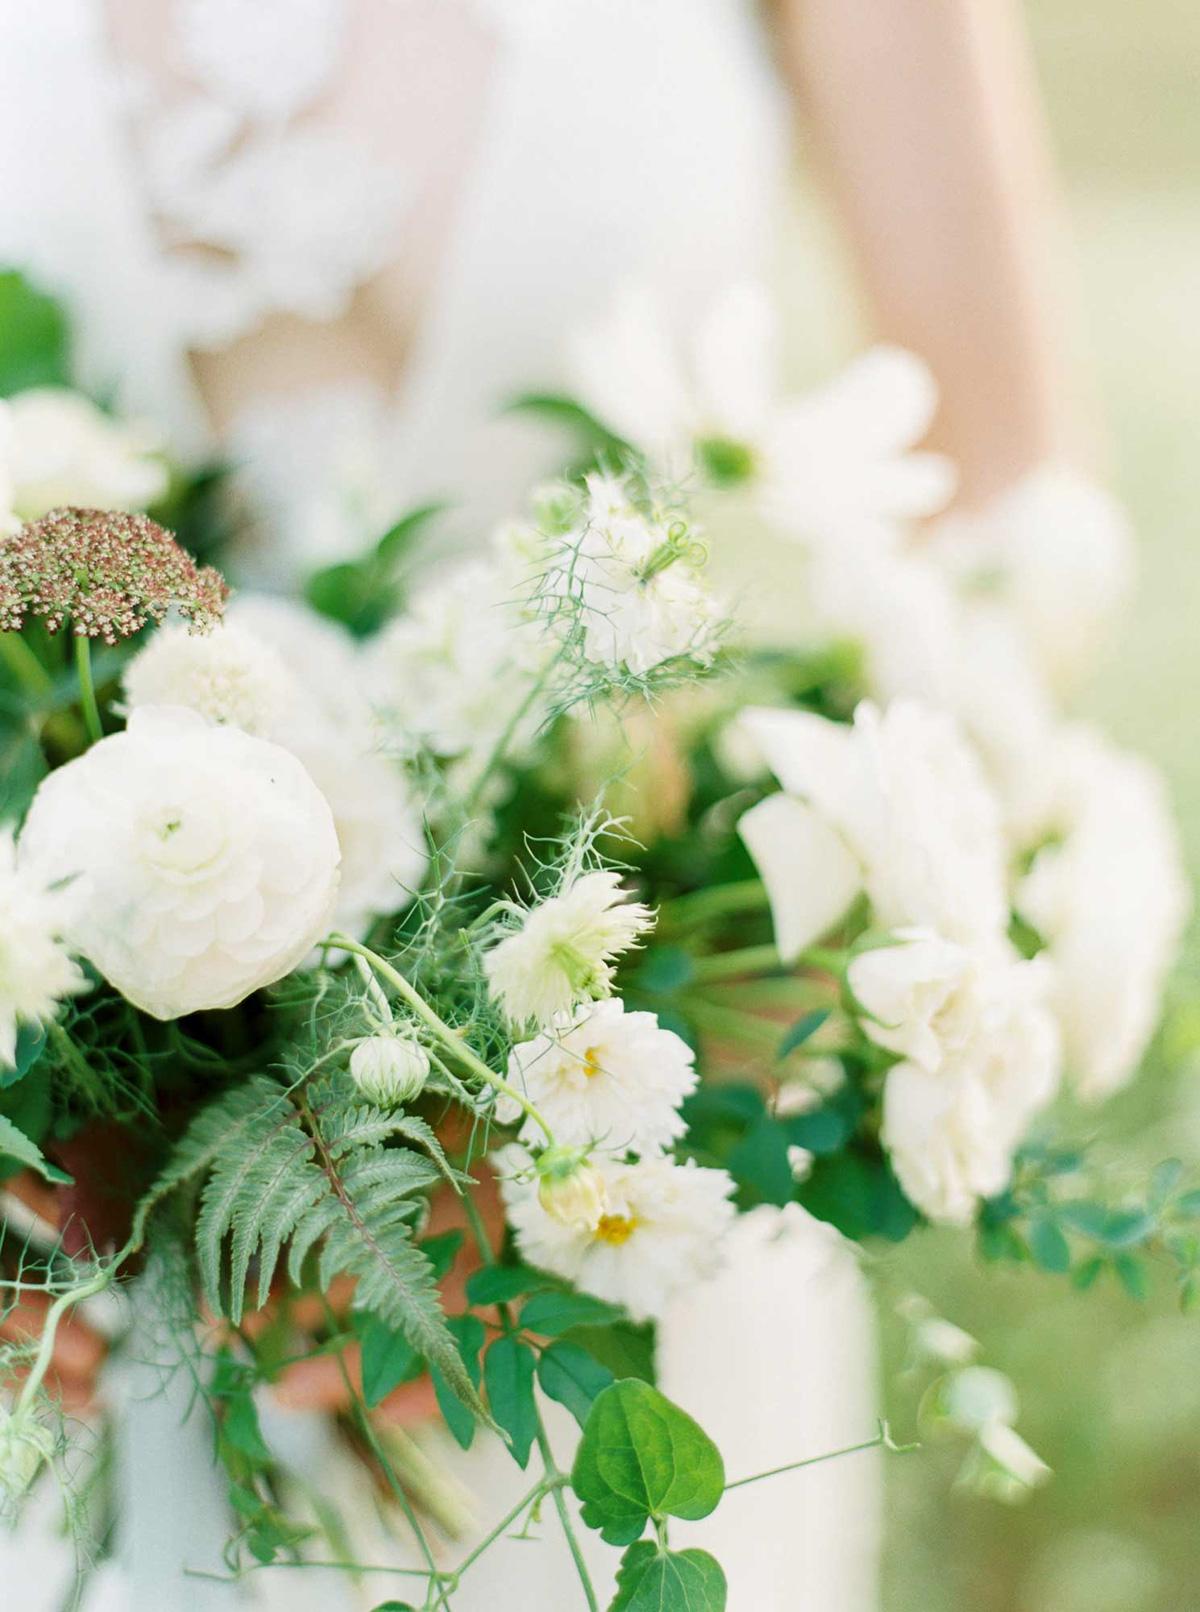 kayla-yestal-vineyard-bride-swish-list-woodland-weddings-niagara-wedding-editorial-34.jpg